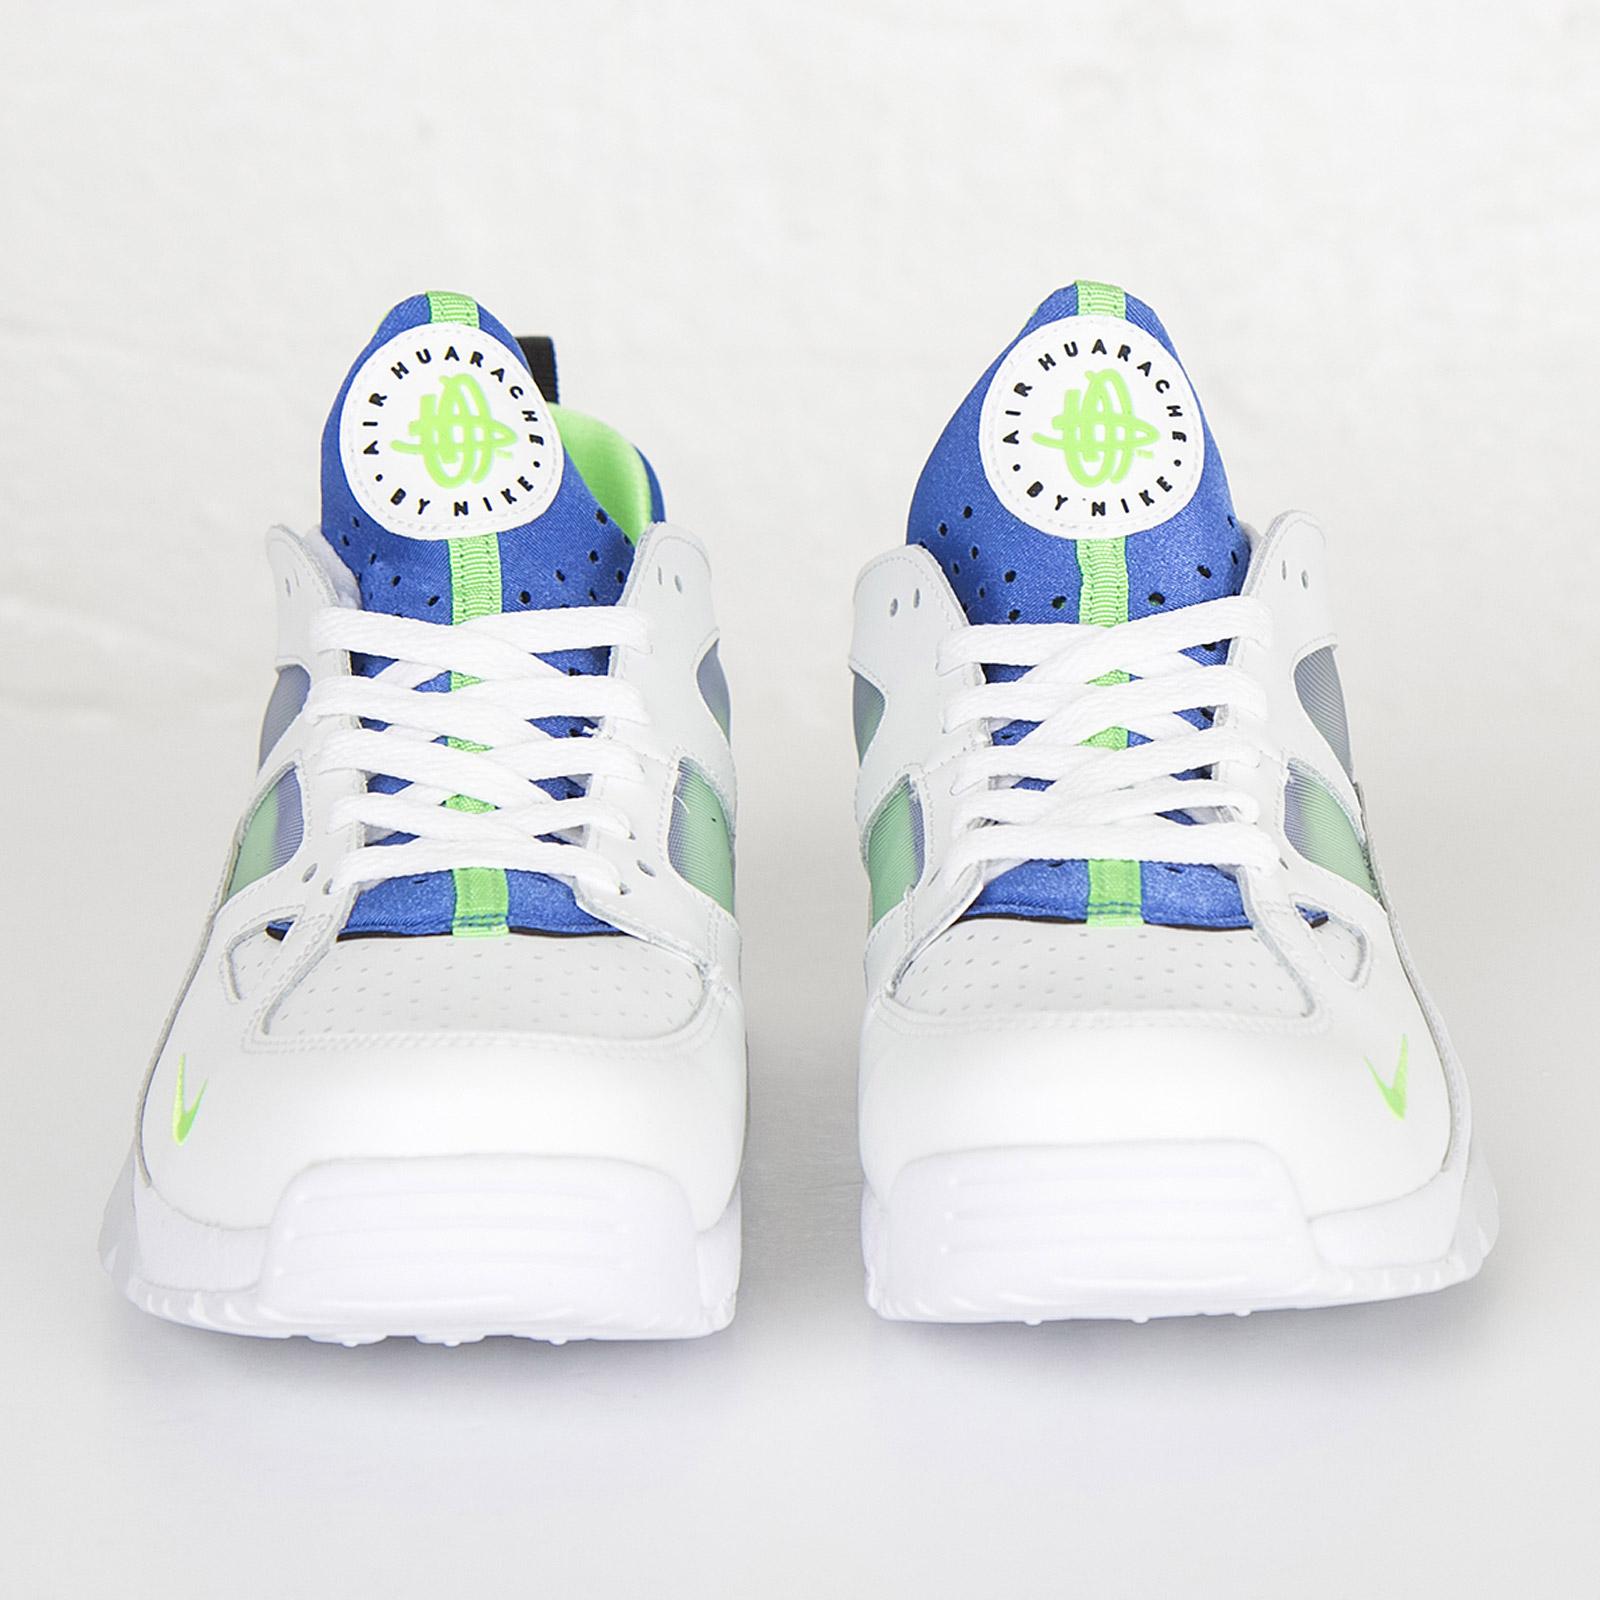 quality design 43877 5c438 Nike Air Trainer Huarache Low - 749447-101 - Sneakersnstuff   sneakers    streetwear online since 1999